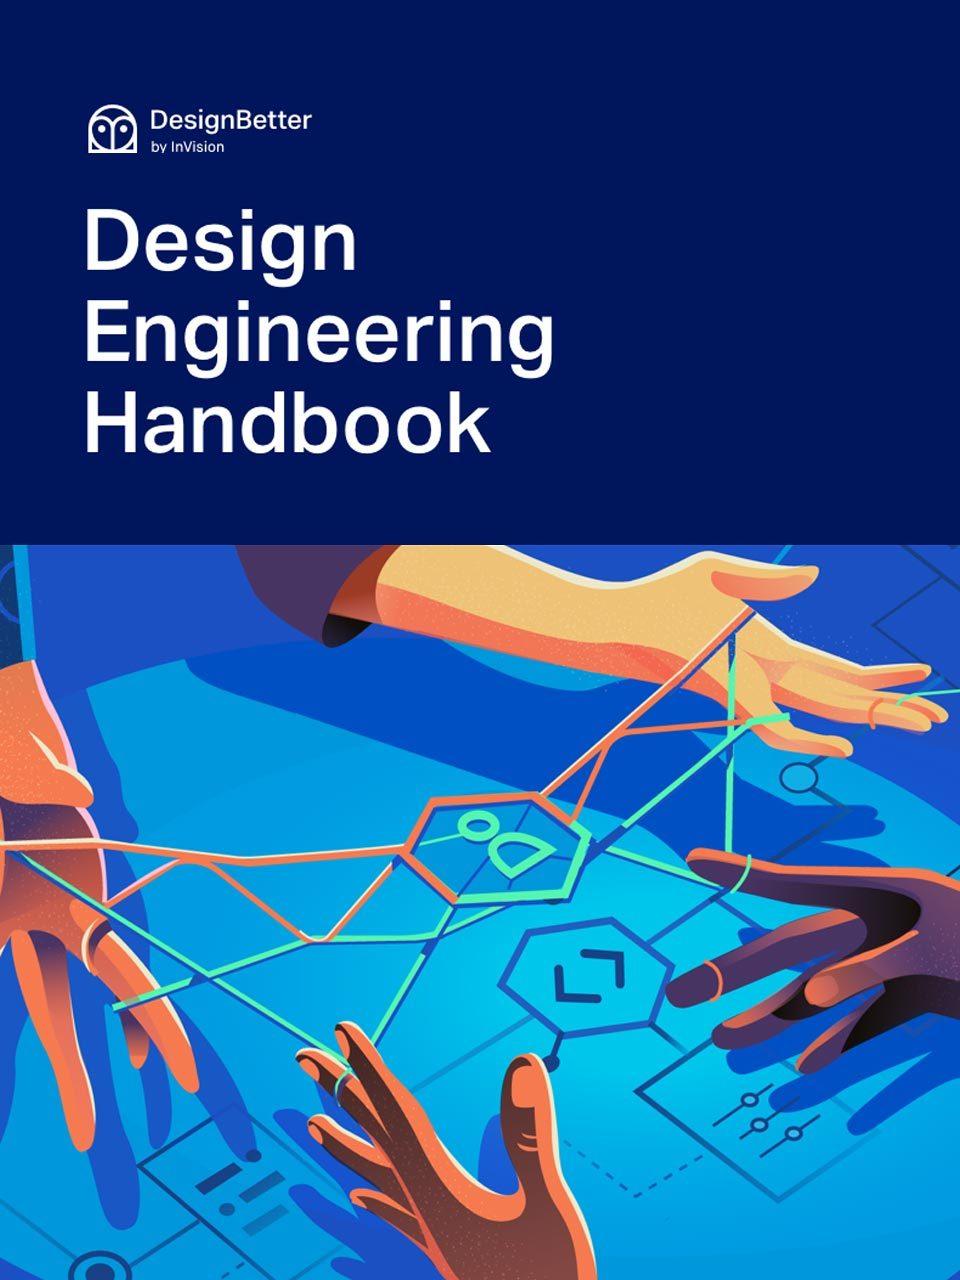 ◎ Design Engineering Handbook